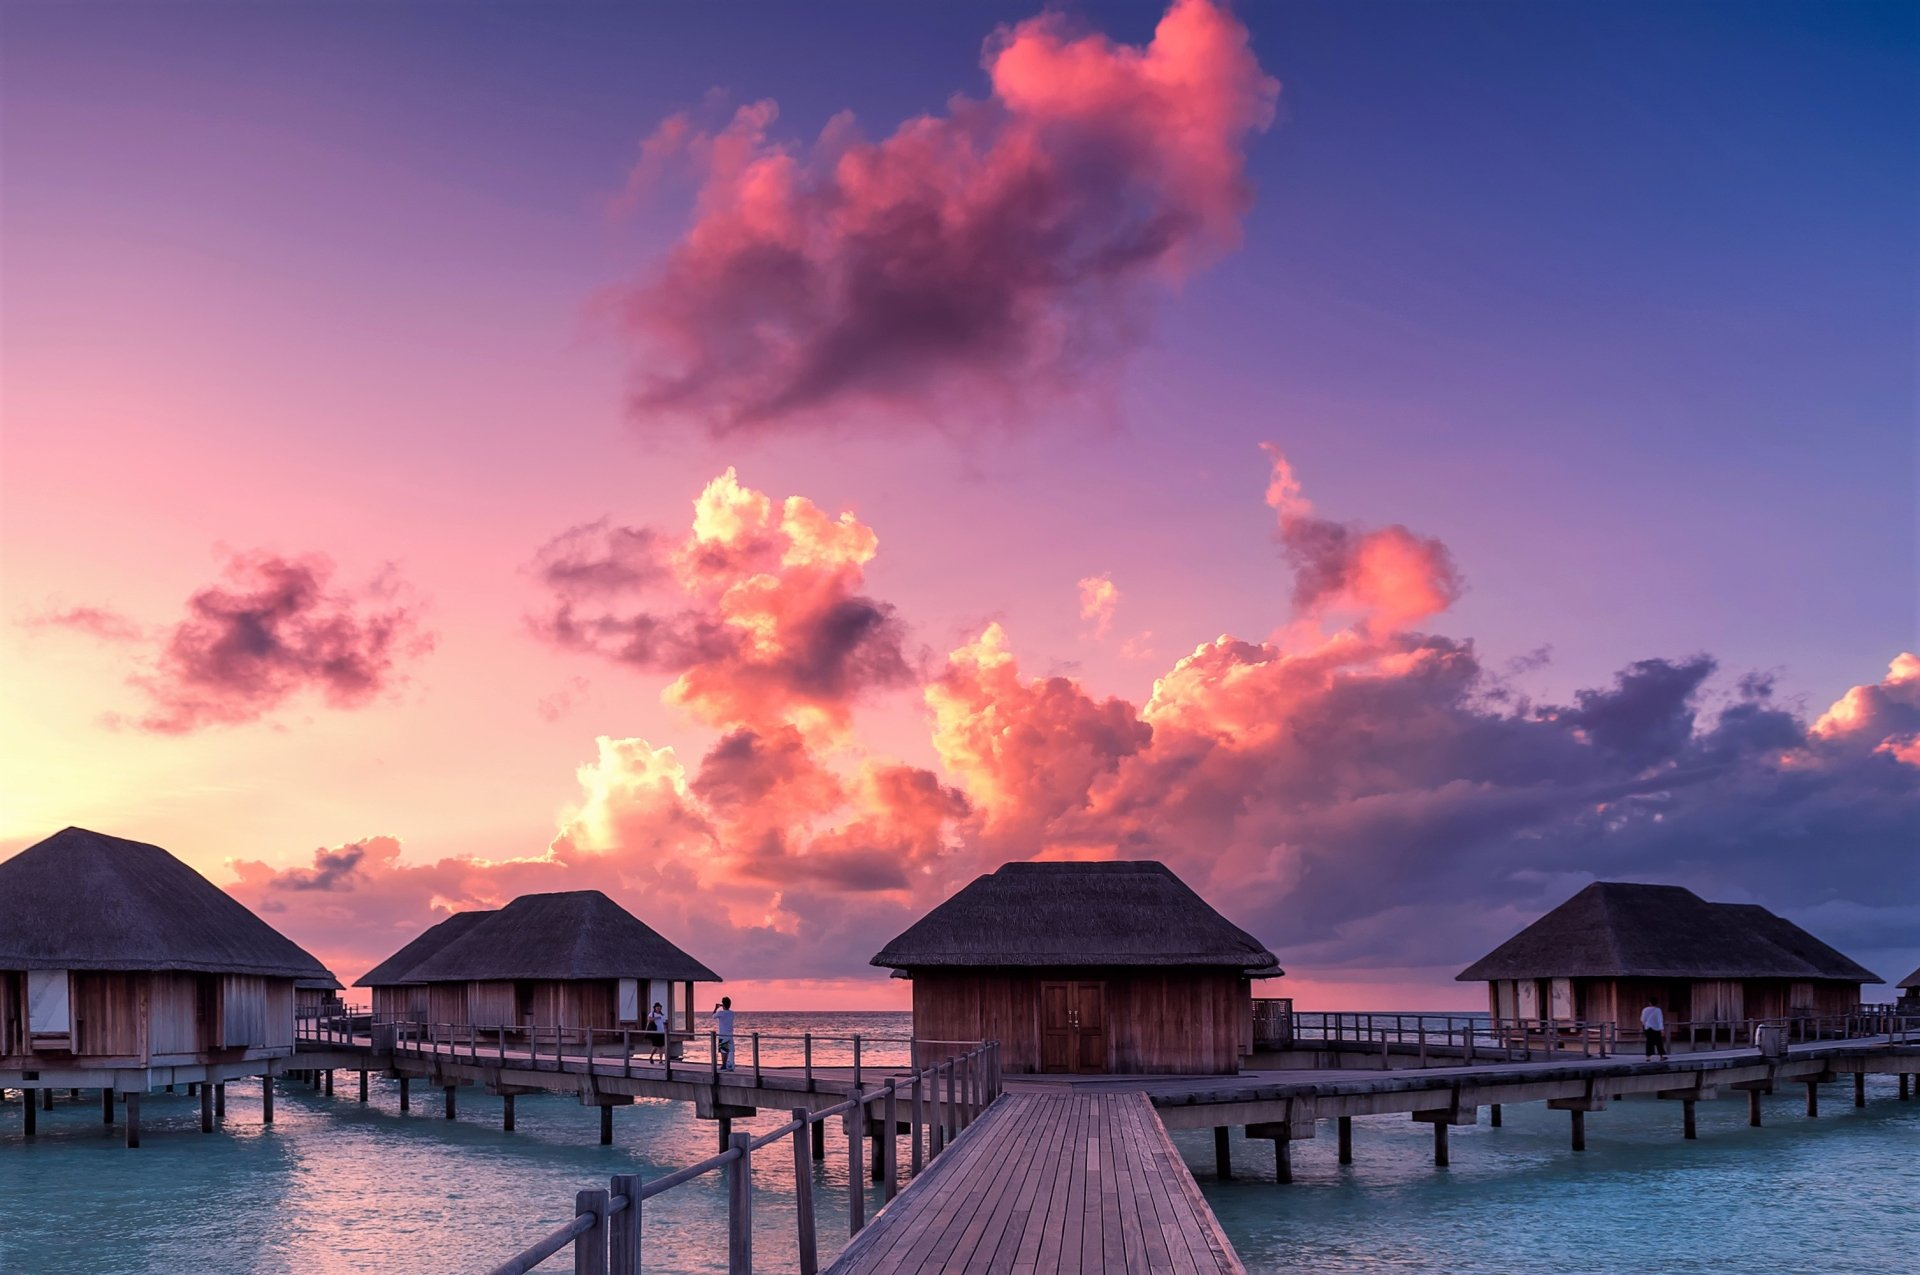 Man Made - Resort  Maldives Havet Sea Hut Bungalow Bakgrund